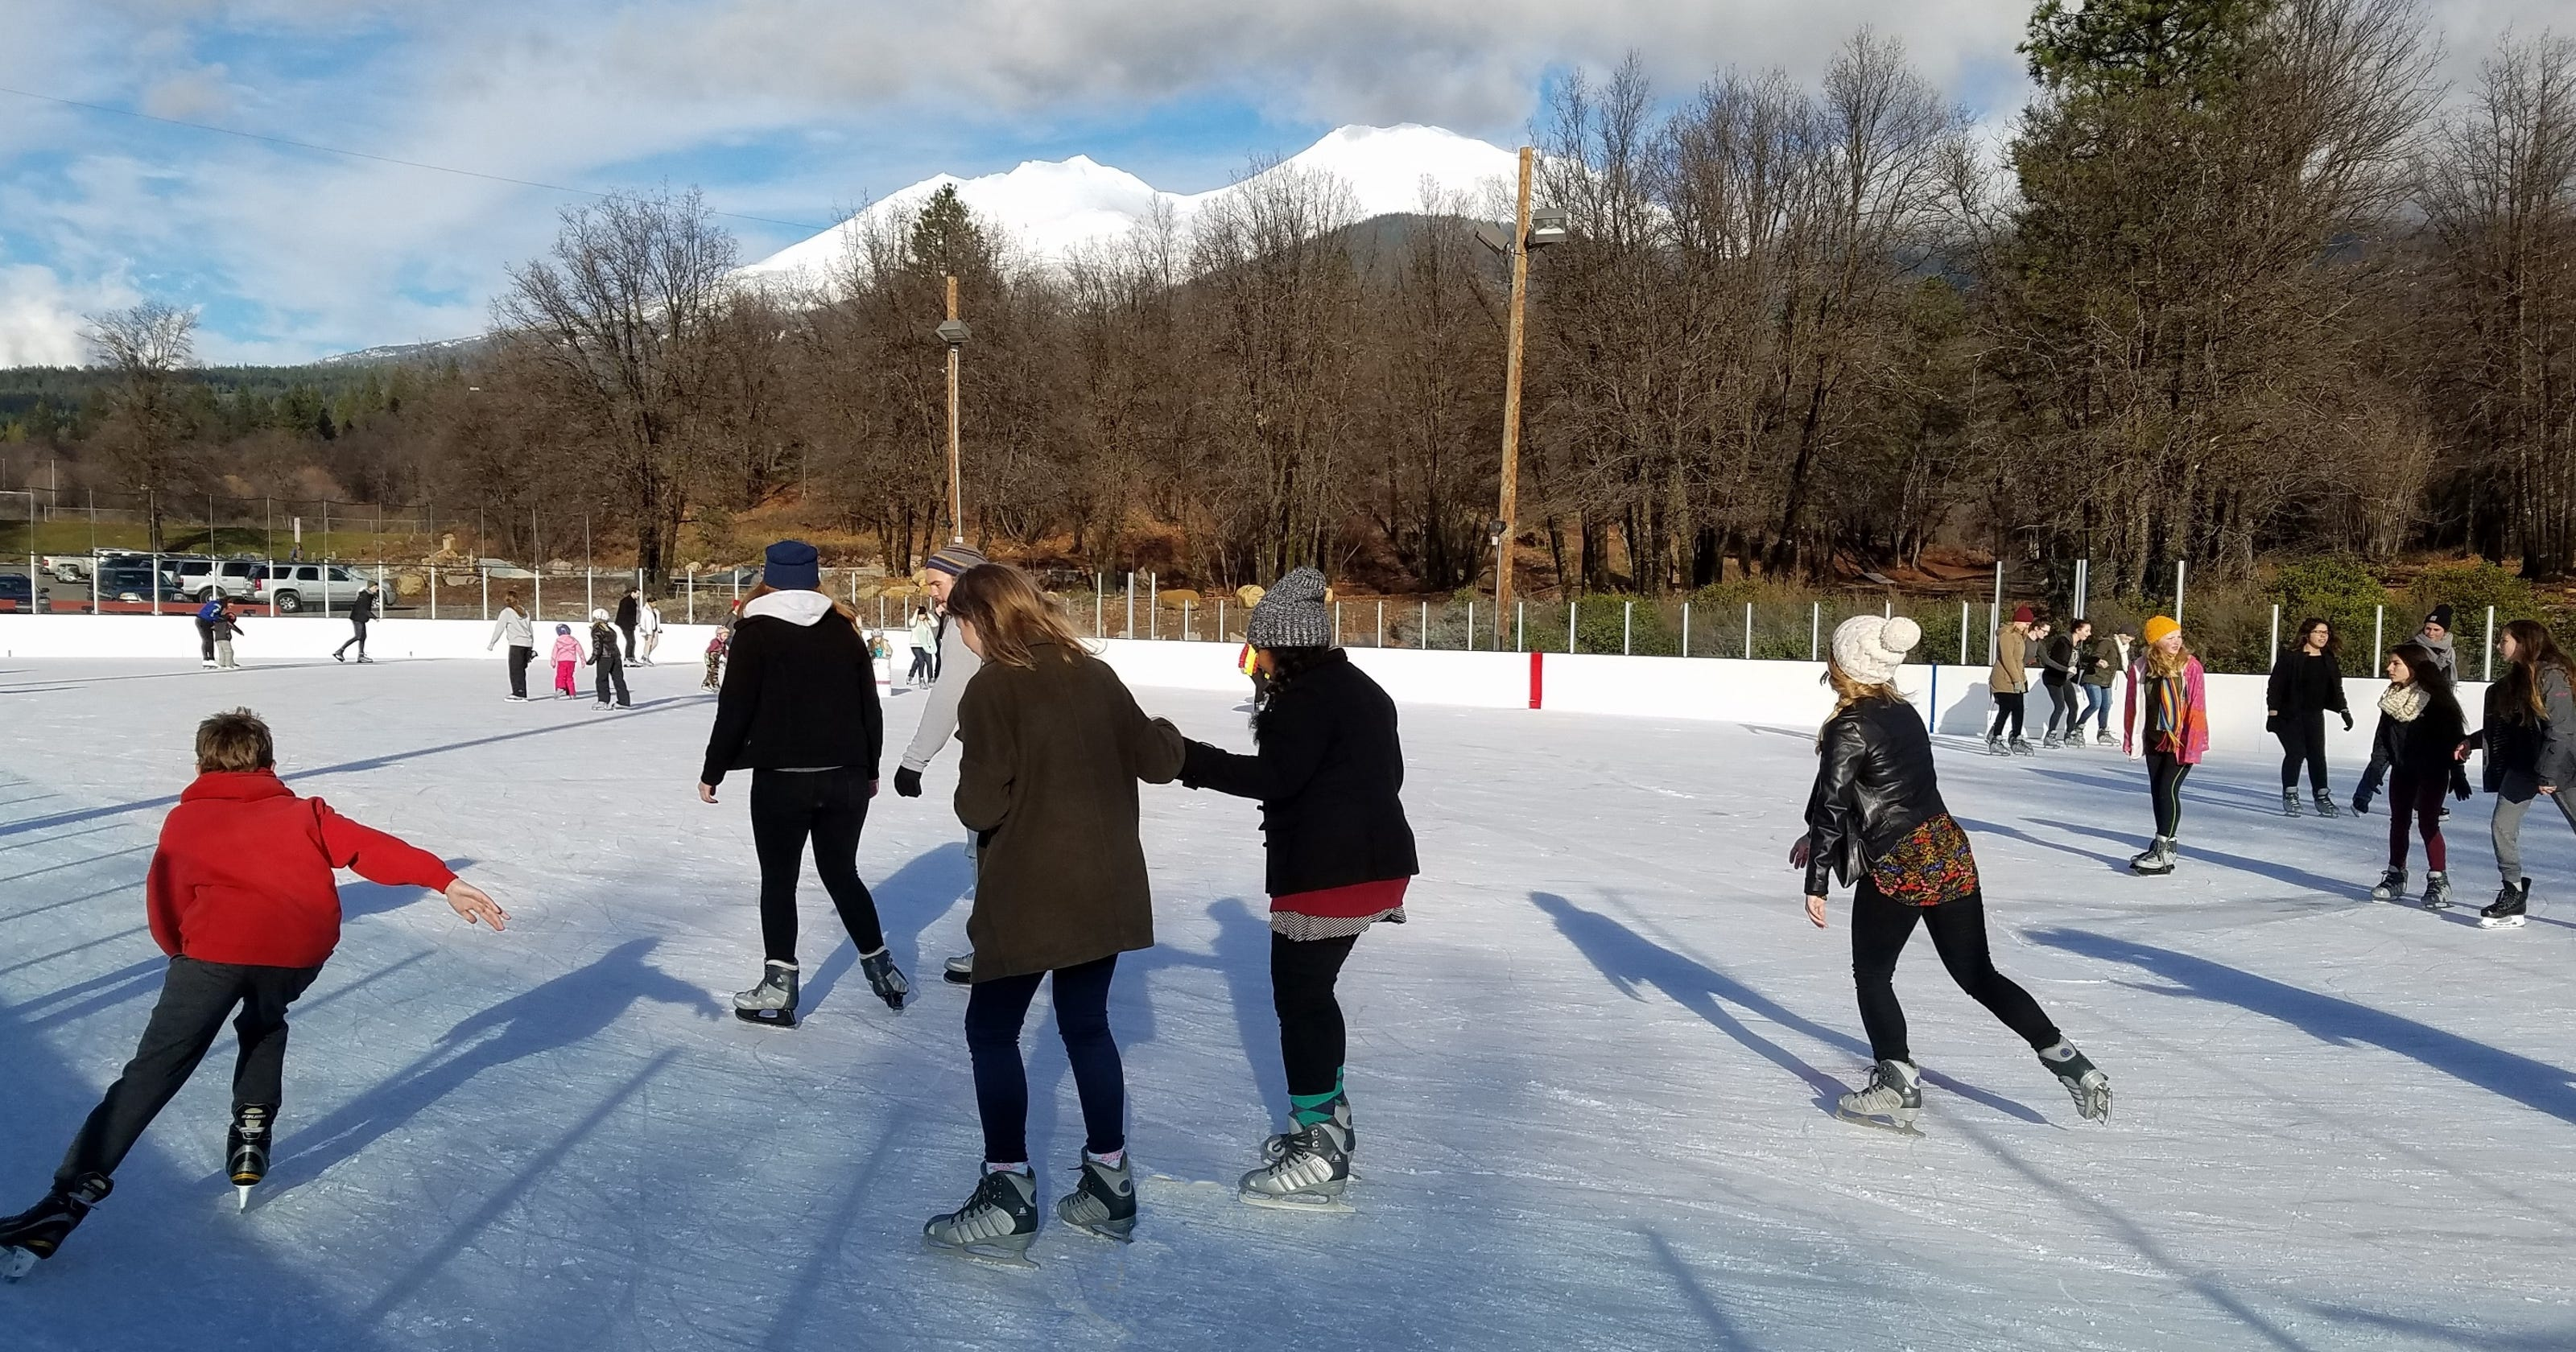 Siskiyou Ice Rink lets you skate near base of Mt. Shasta